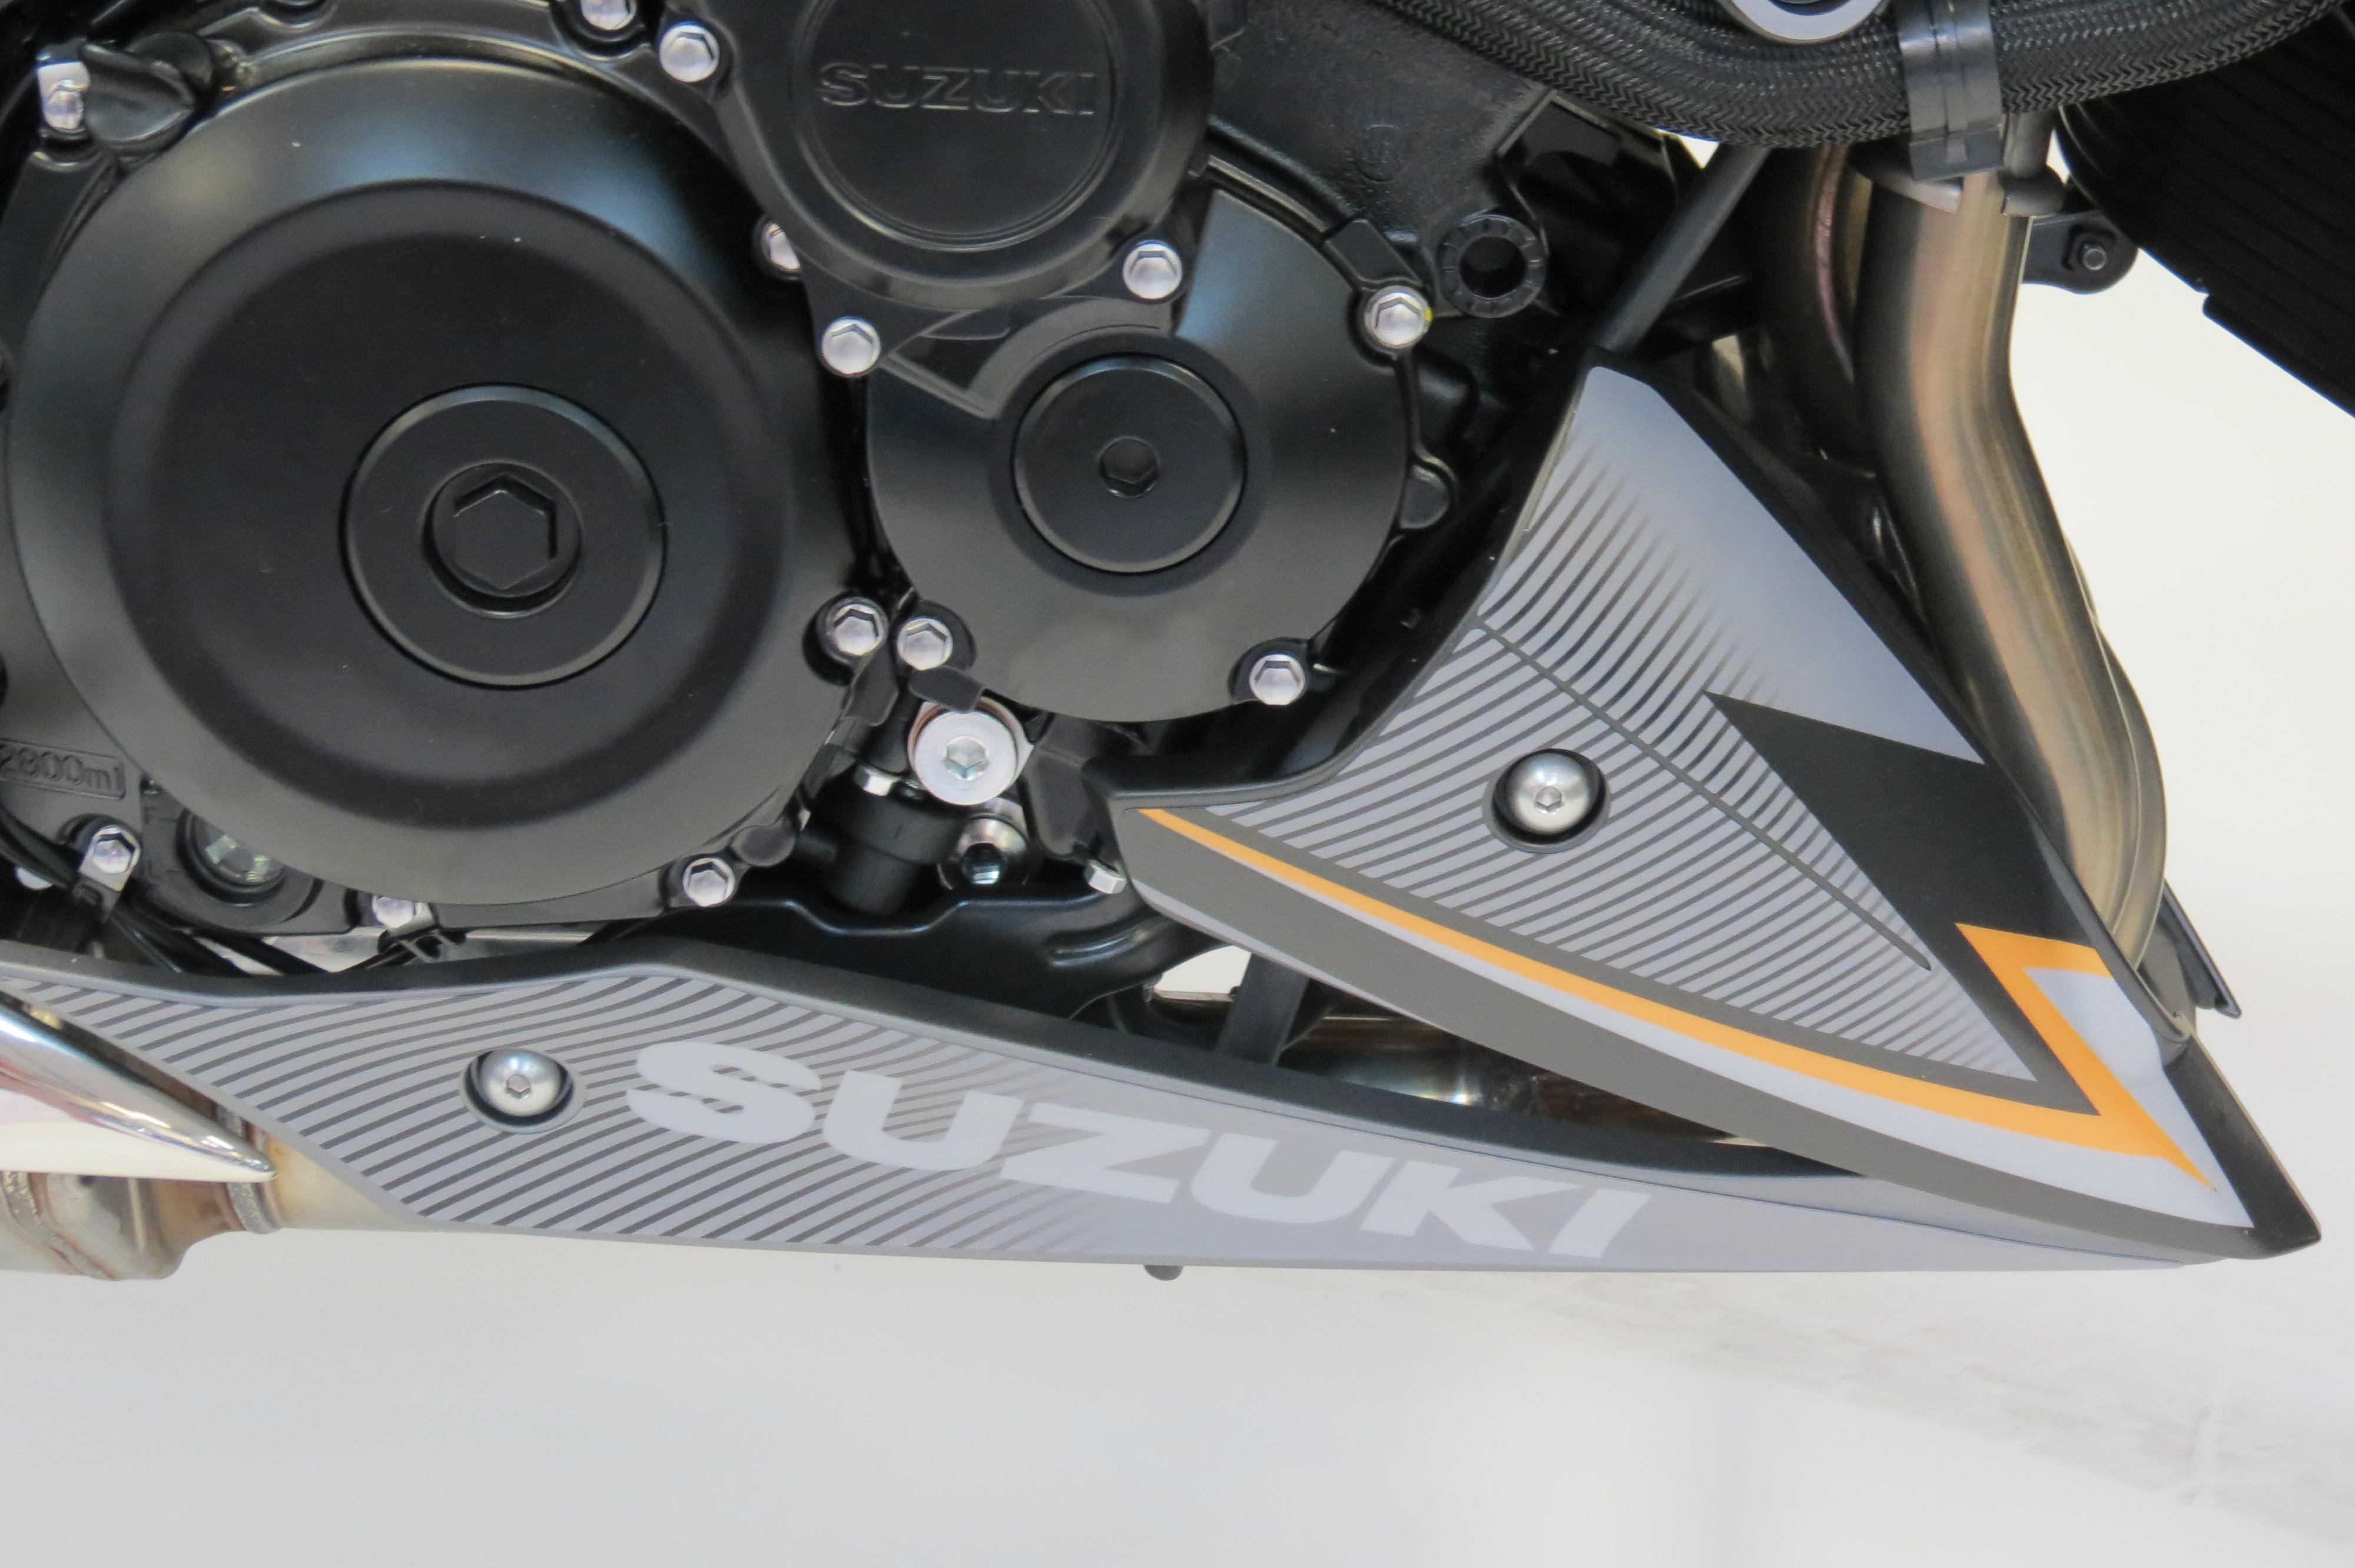 GSX-S 1000 KUTVECK